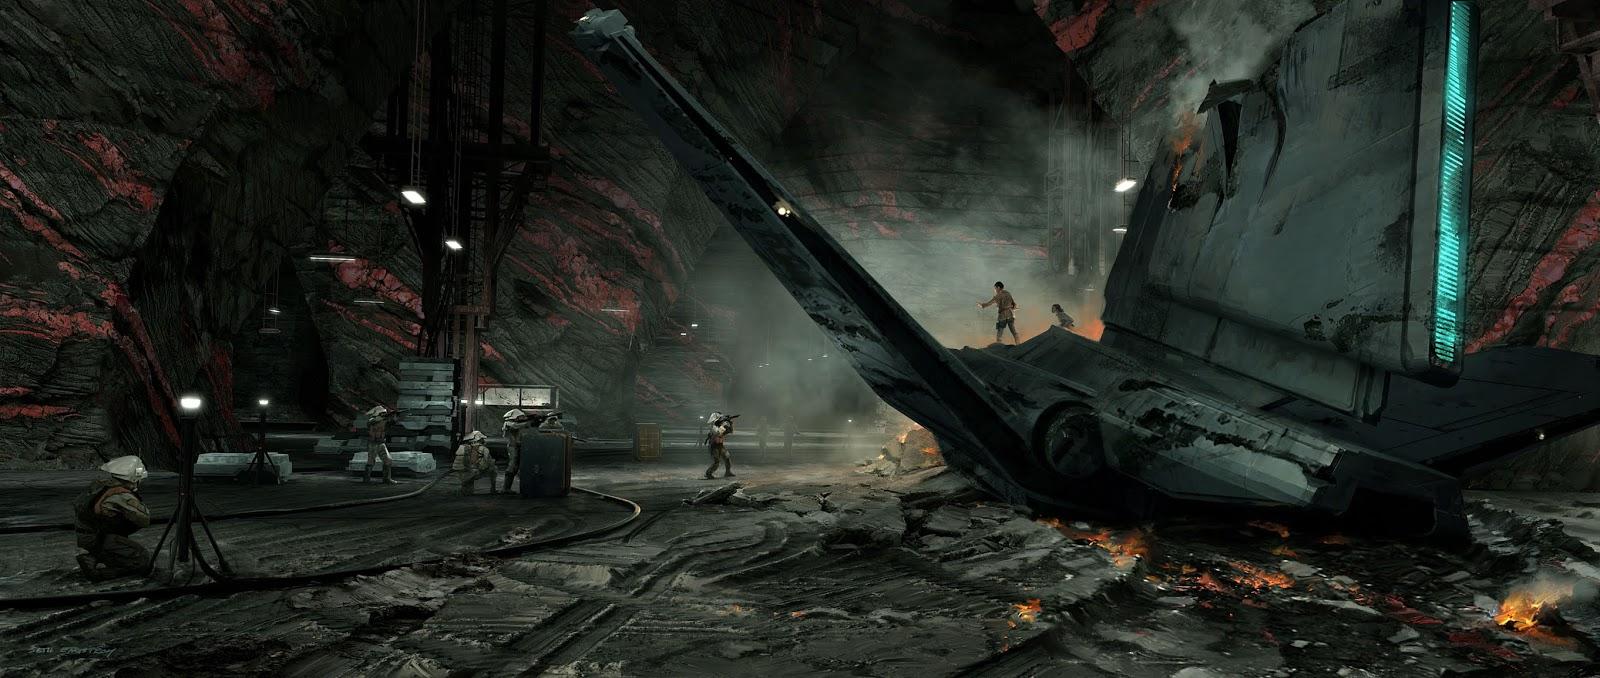 Star-Wars-The-Last-Jedi-Crait-MineBase-S